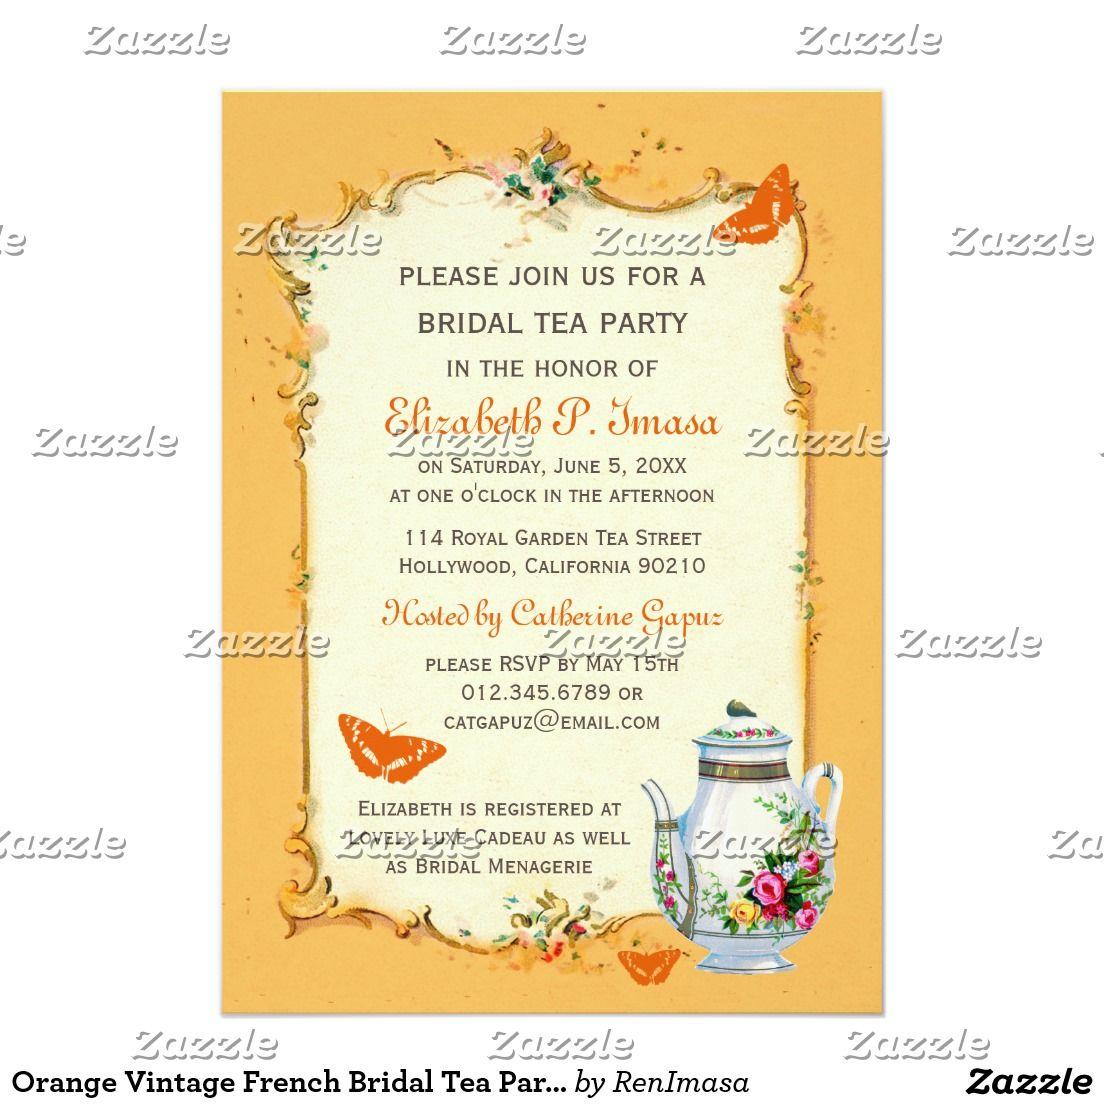 Orange Vintage French Bridal Tea Party | WEDDING: BRIDAL SHOWER TEA ...